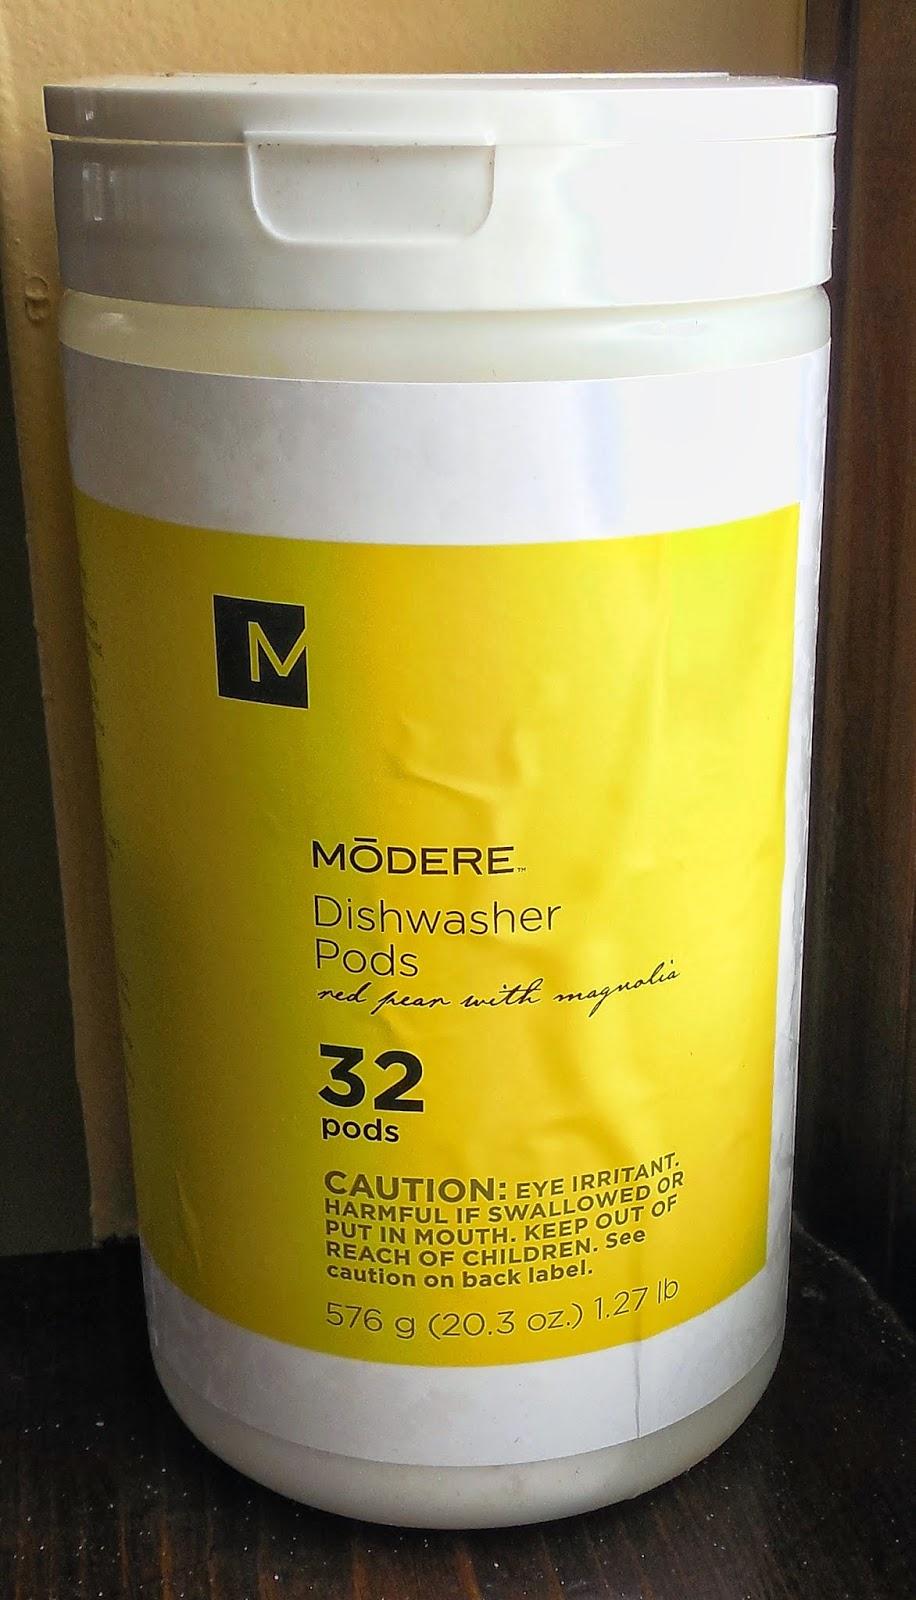 Modere Dishwasher Pods